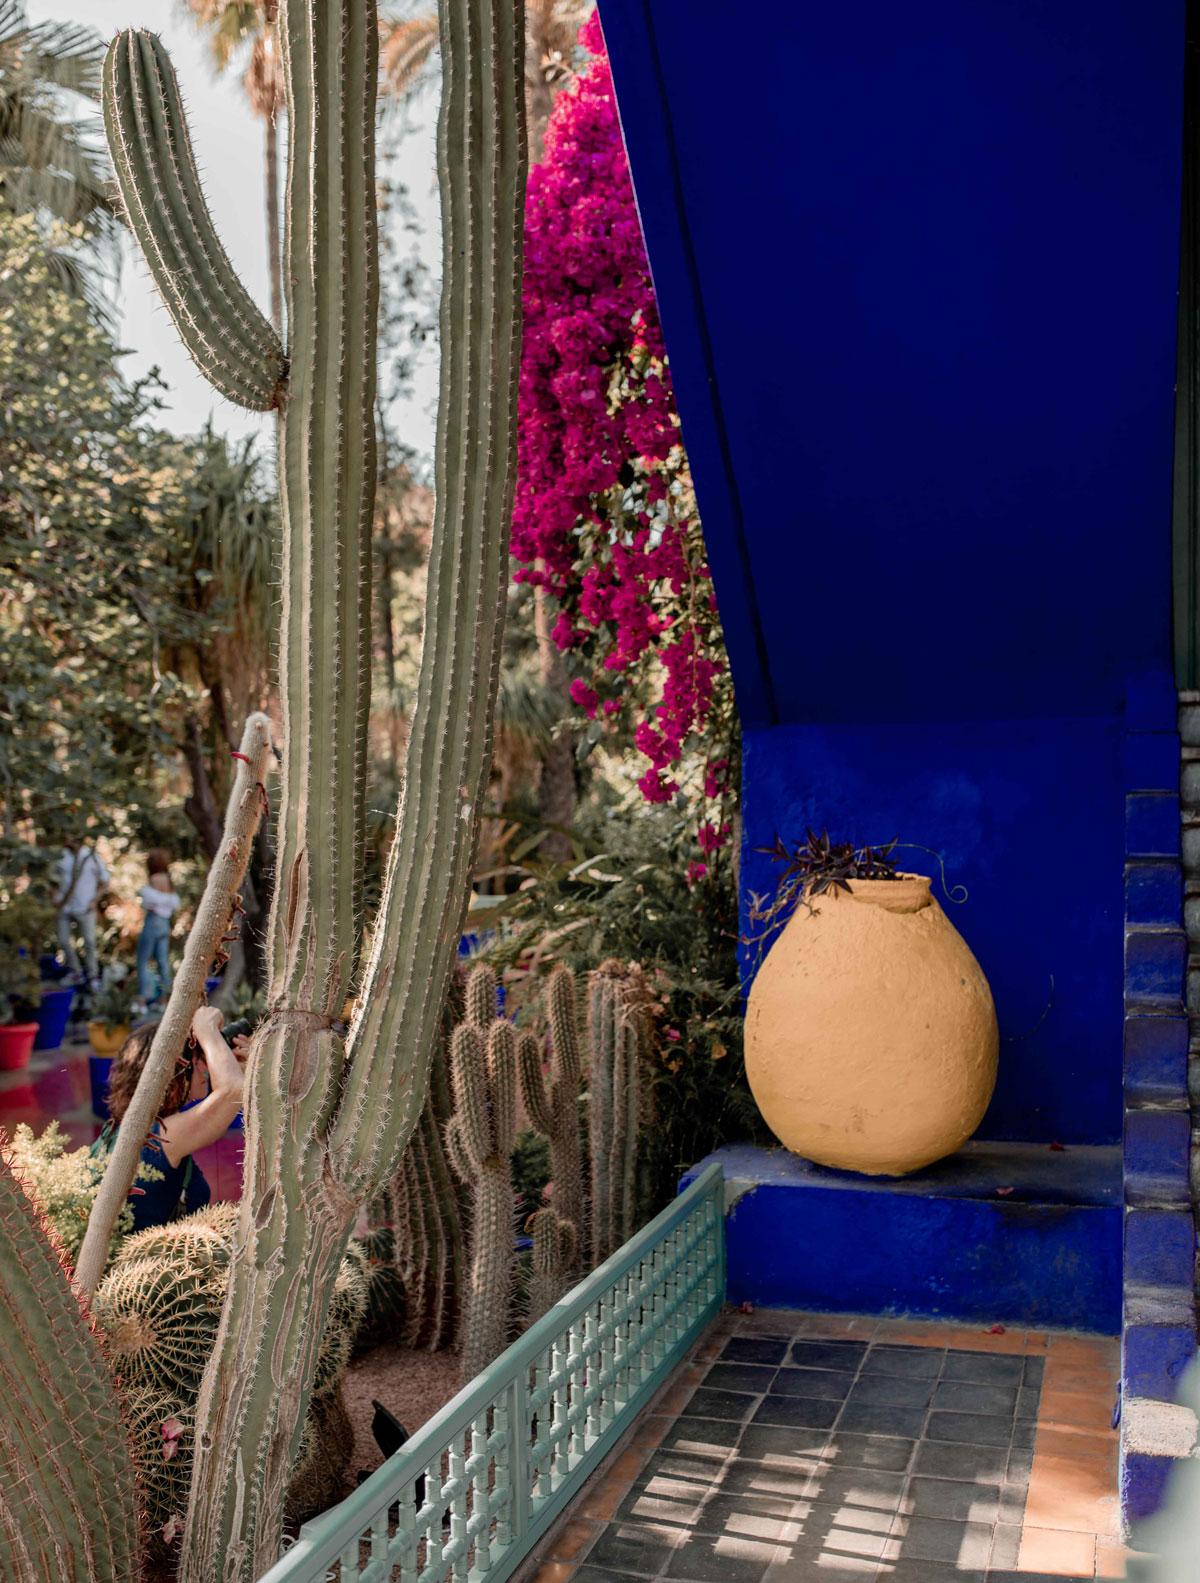 3-Top-things-to-do-in-marrakech-Bucket-list-kelseyinlondon-Kelsey-Heinrichs--What-to-do-in-marrakech--Where-to-go-in-marrakech-top-places-in-marrakech-le-jardin-majorelle